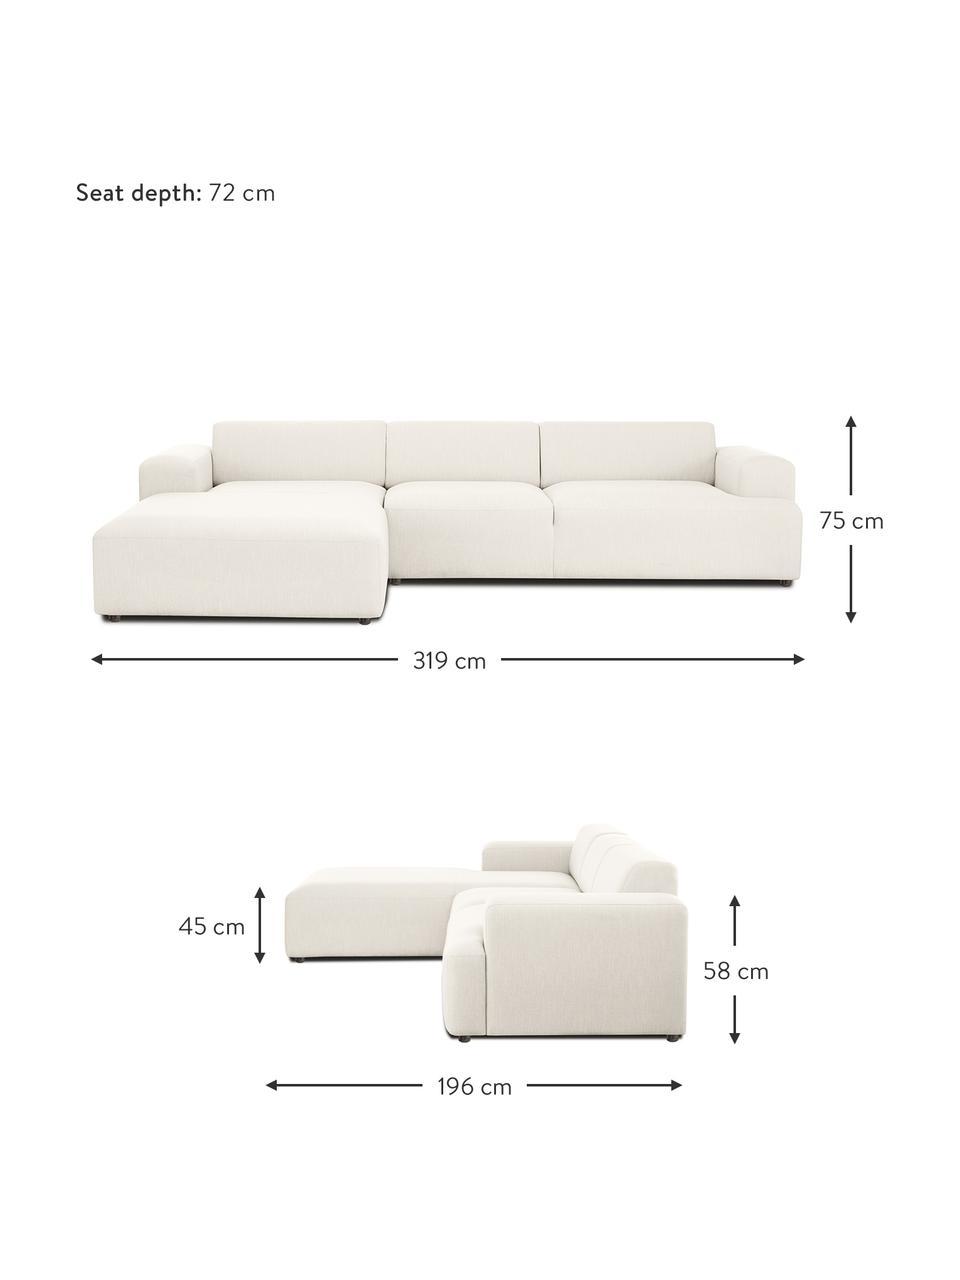 Ecksofa Melva (4-Sitzer) in Beige, Bezug: 100% Polyester Der hochwe, Gestell: Massives Kiefernholz, FSC, Füße: Kunststoff, Webstoff Beige, B 319 x T 196 cm